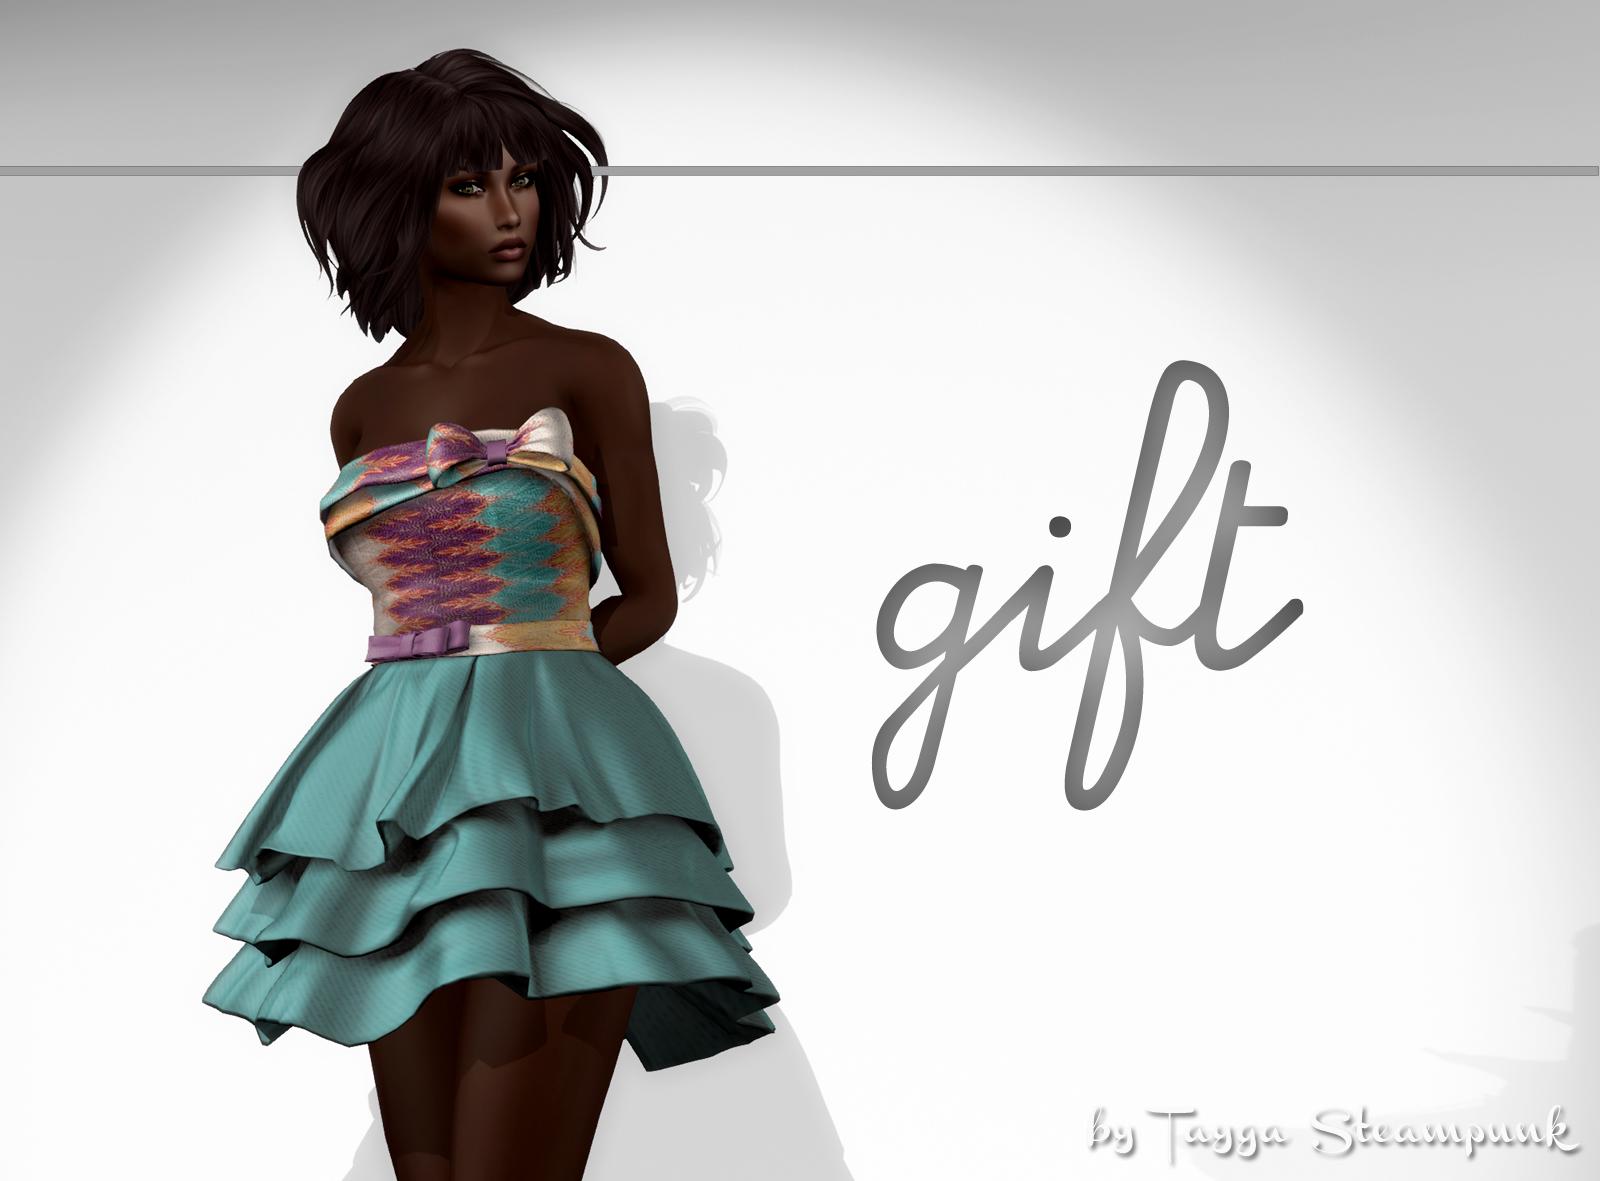 Catálogo de Gift #48